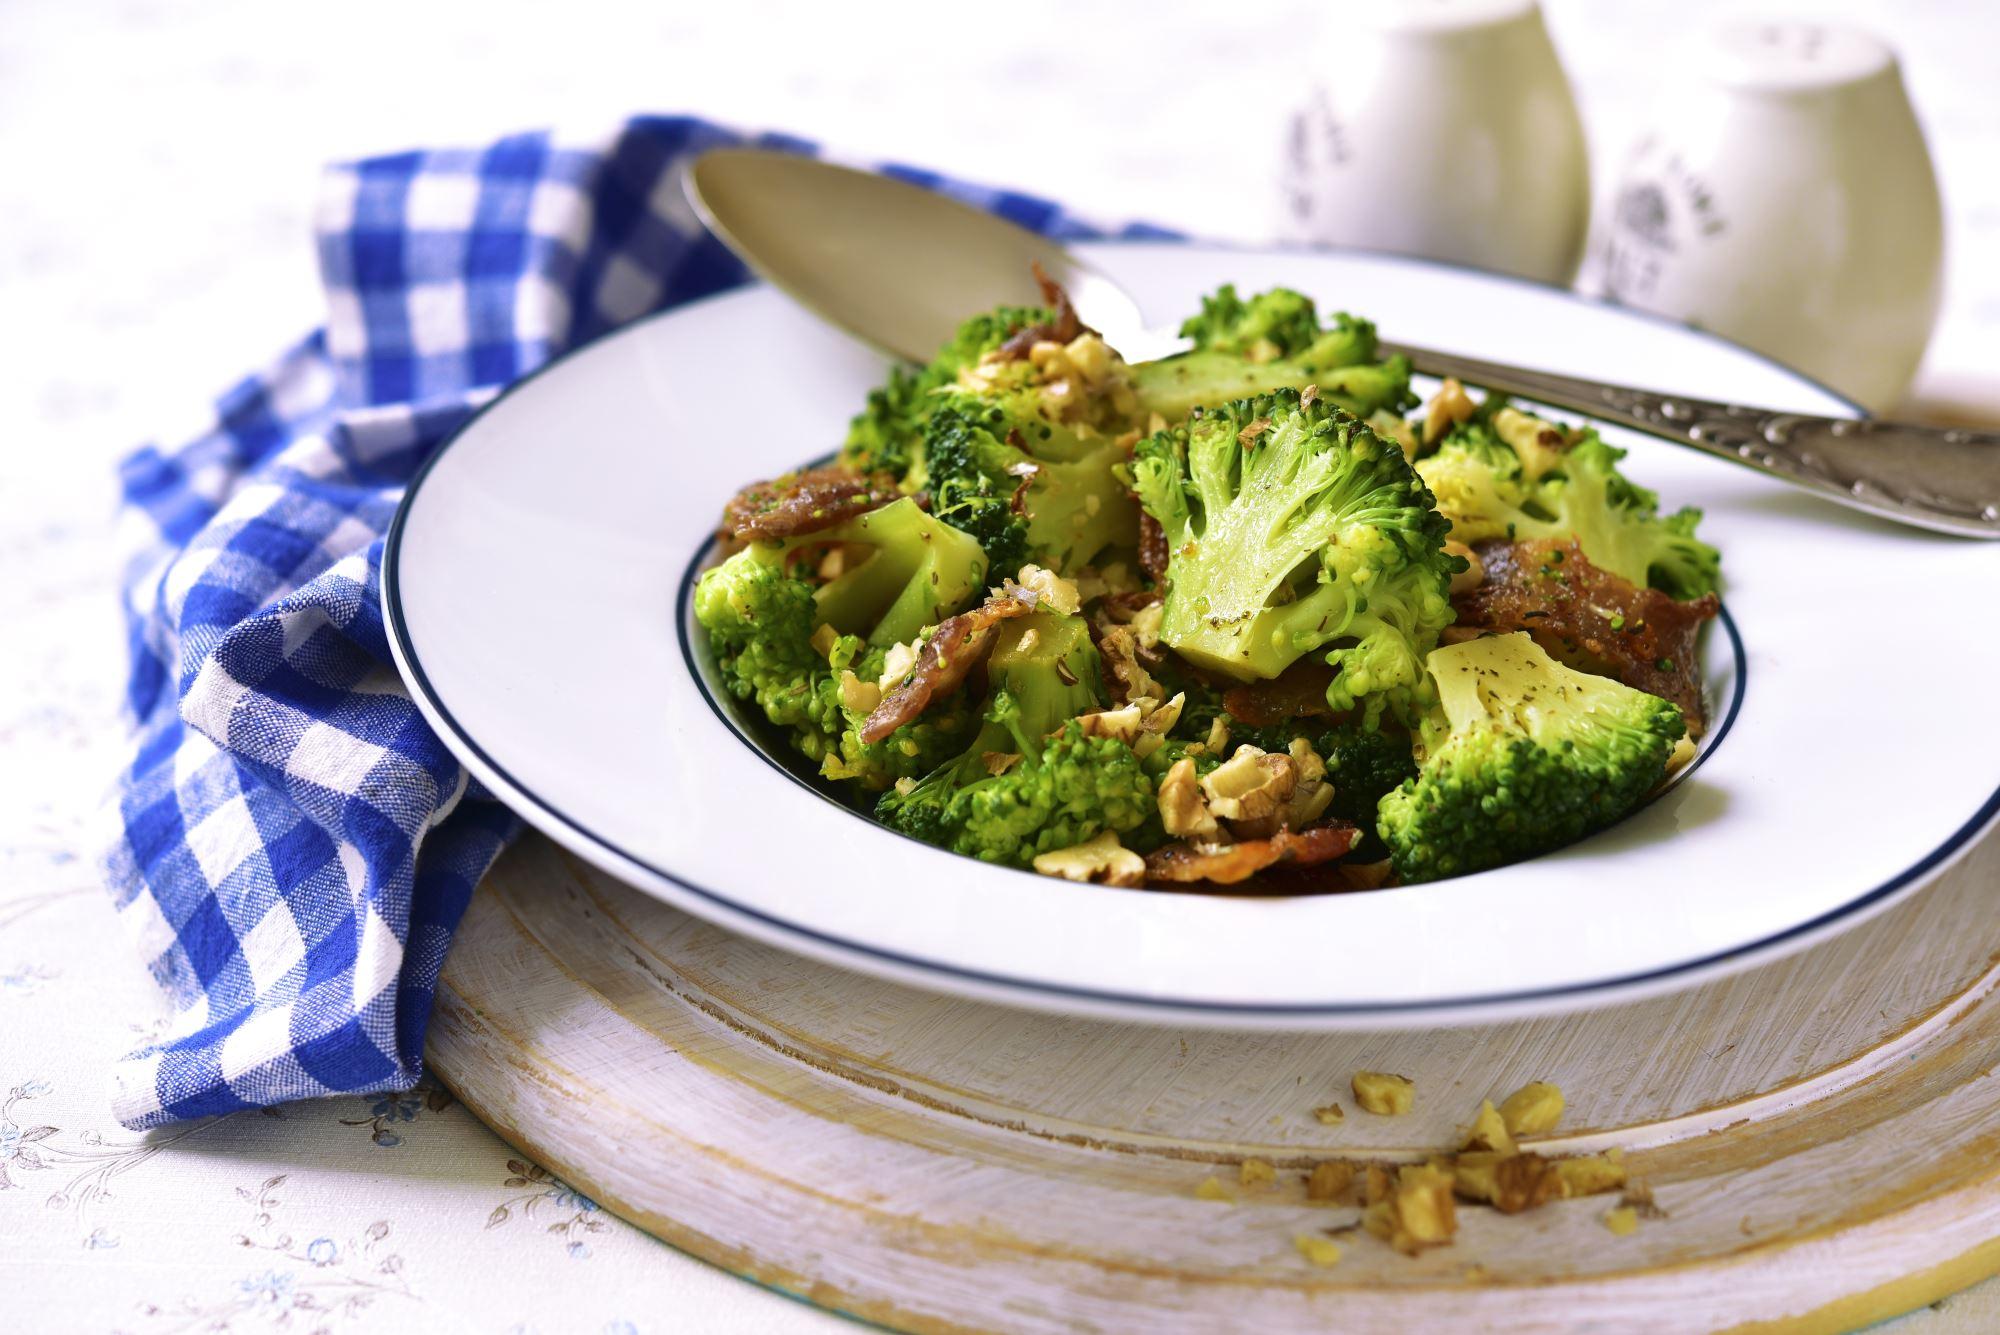 Broccoli med bacon